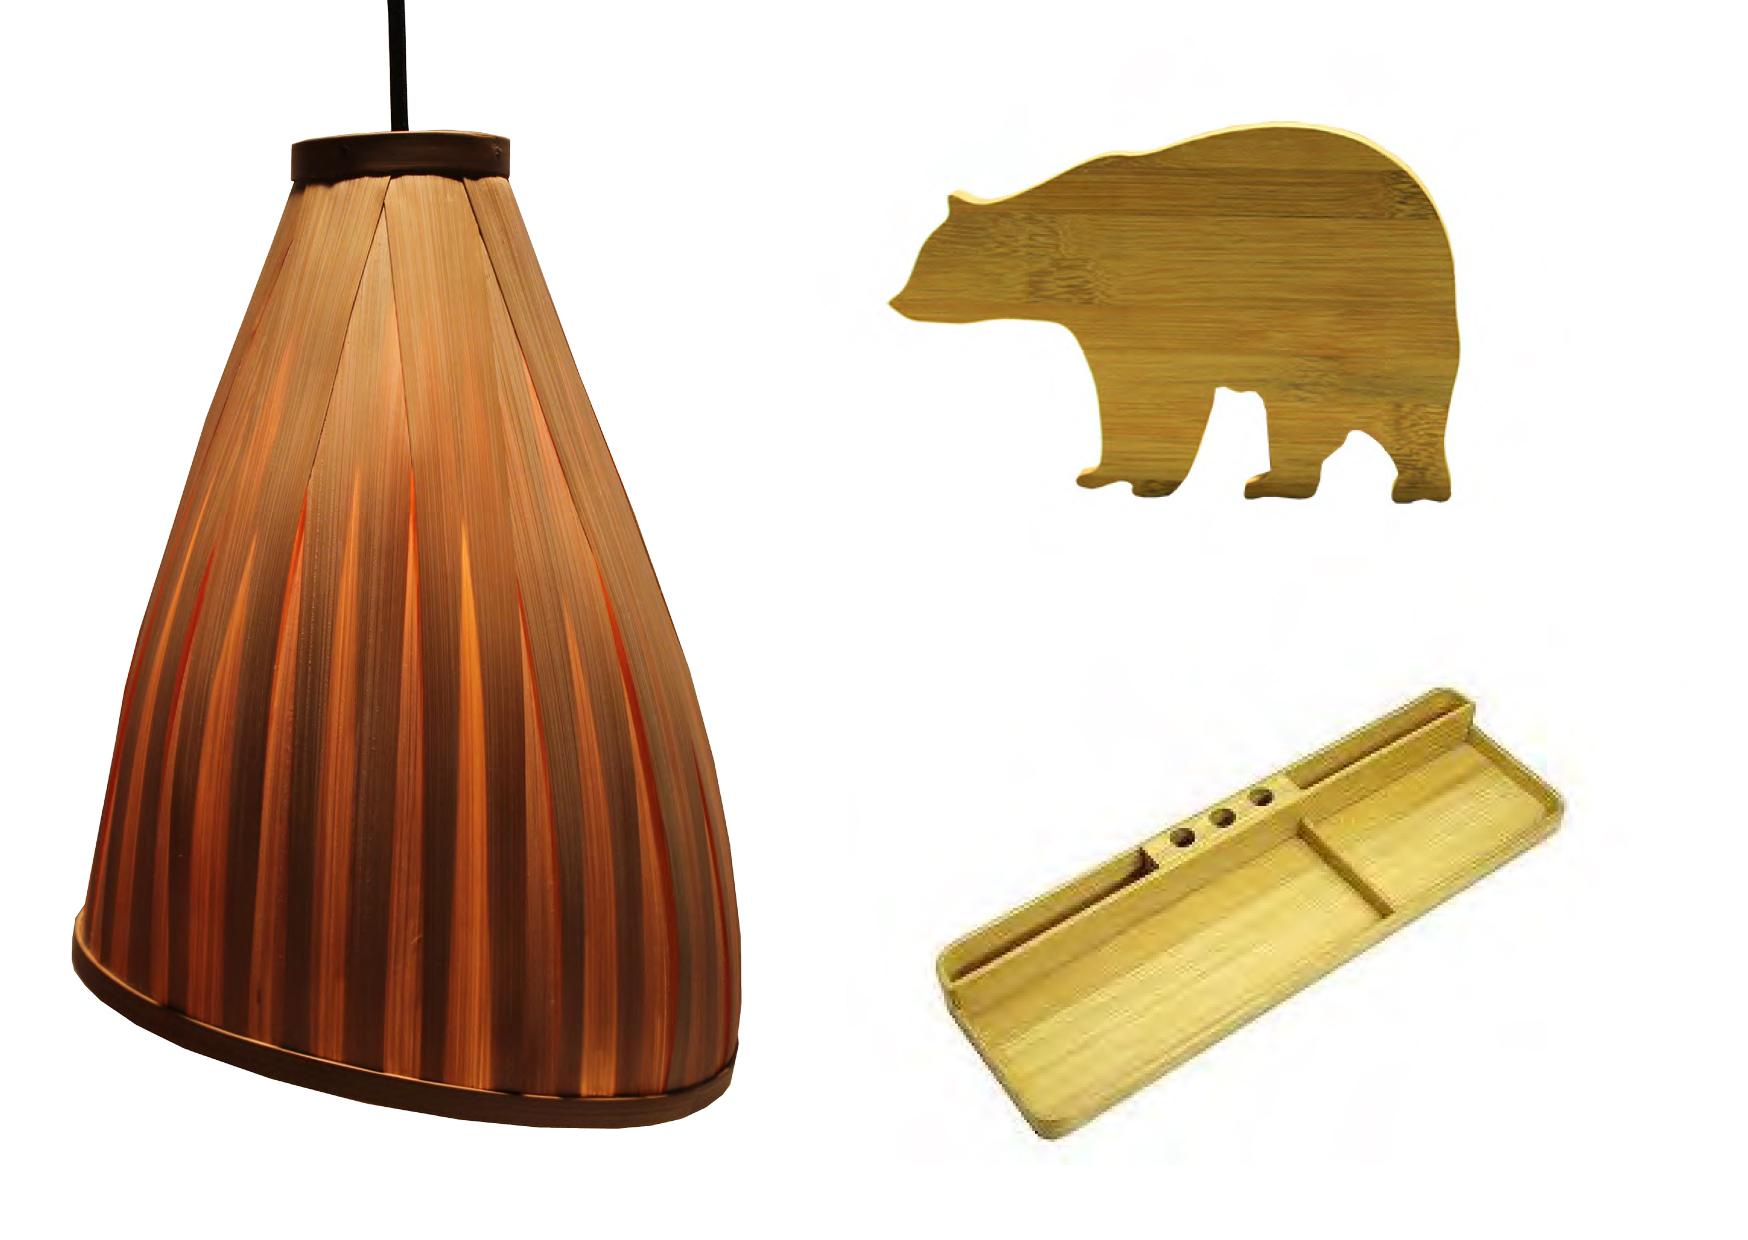 Tapir Translucent Lamp, Dali Stationery | Foto : sarasvati.com